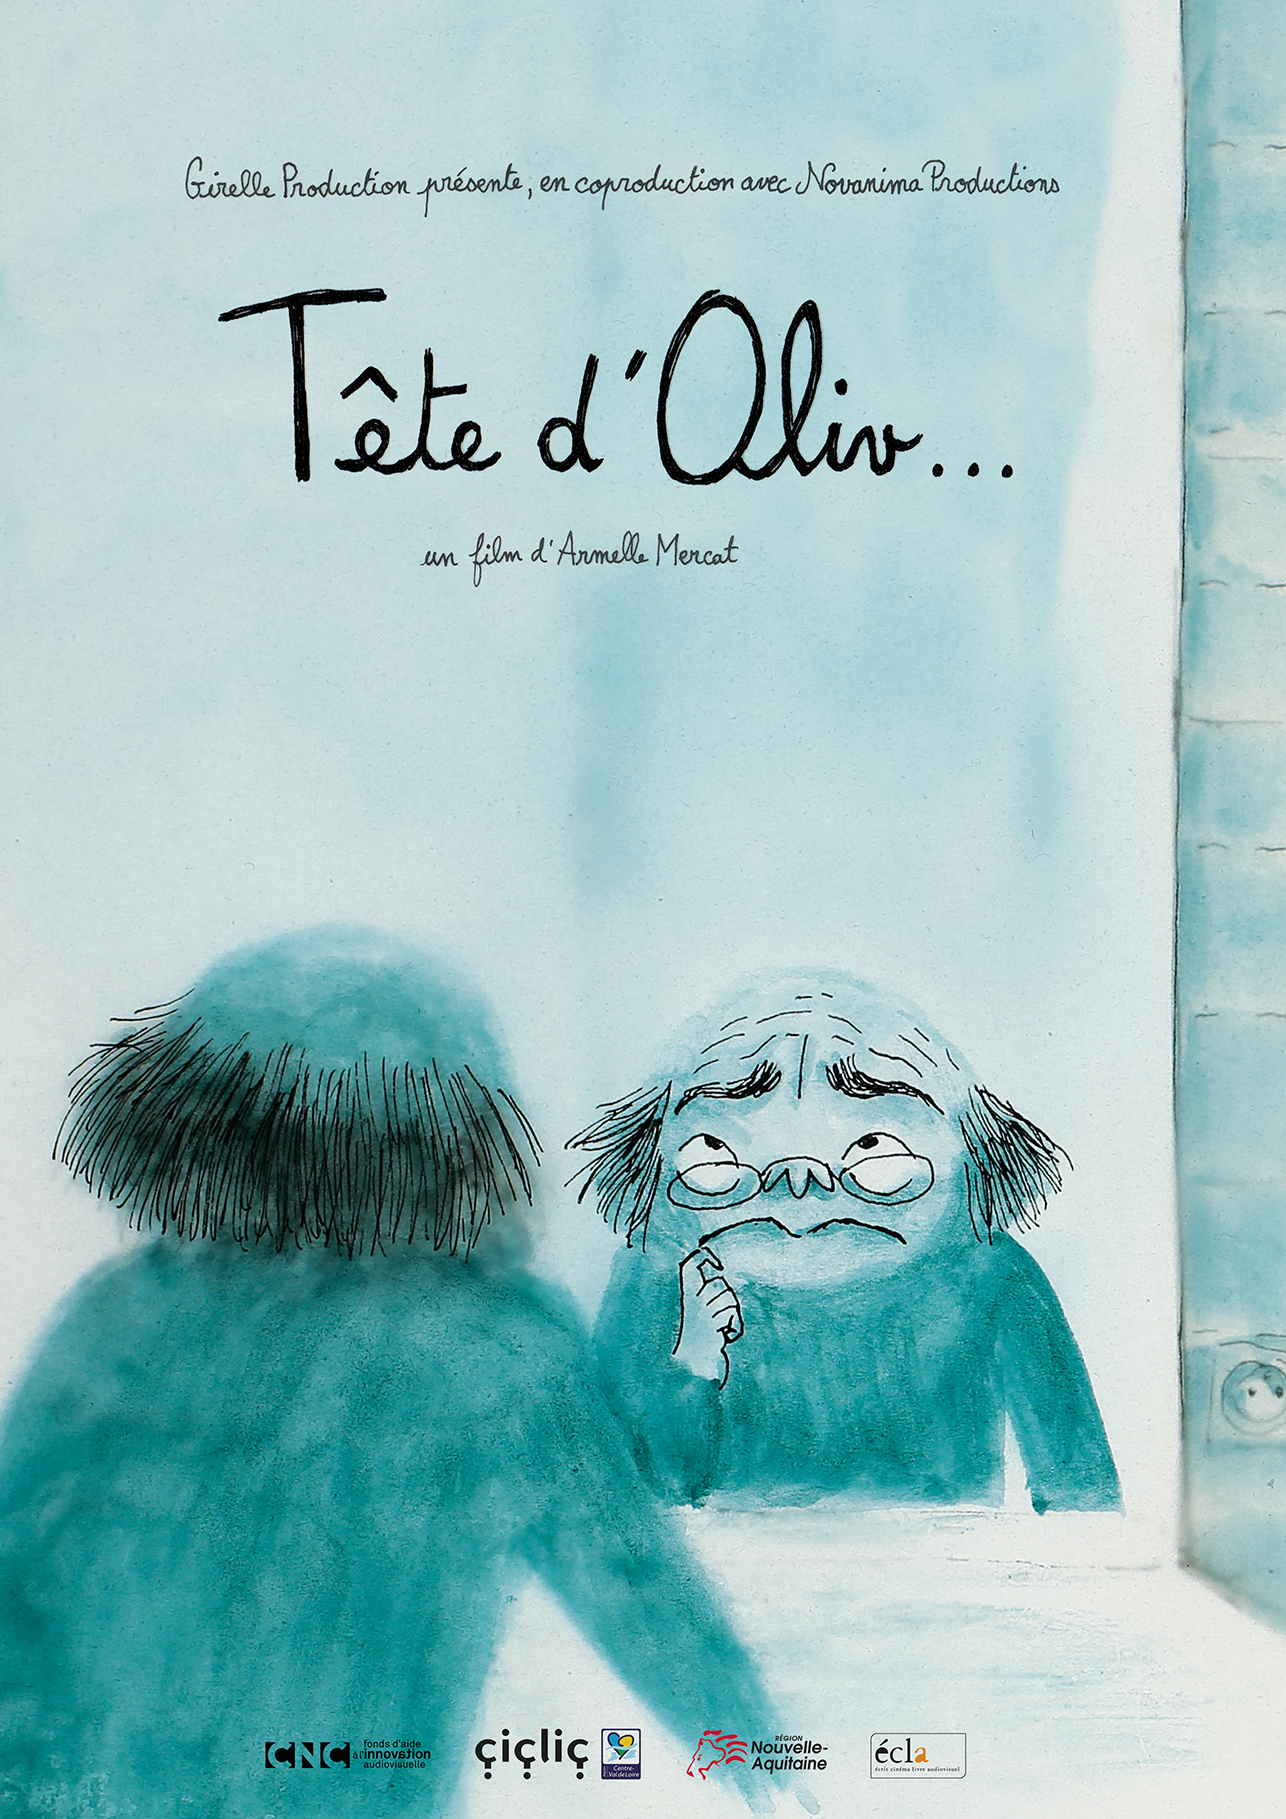 affiche-teted'oliv 2